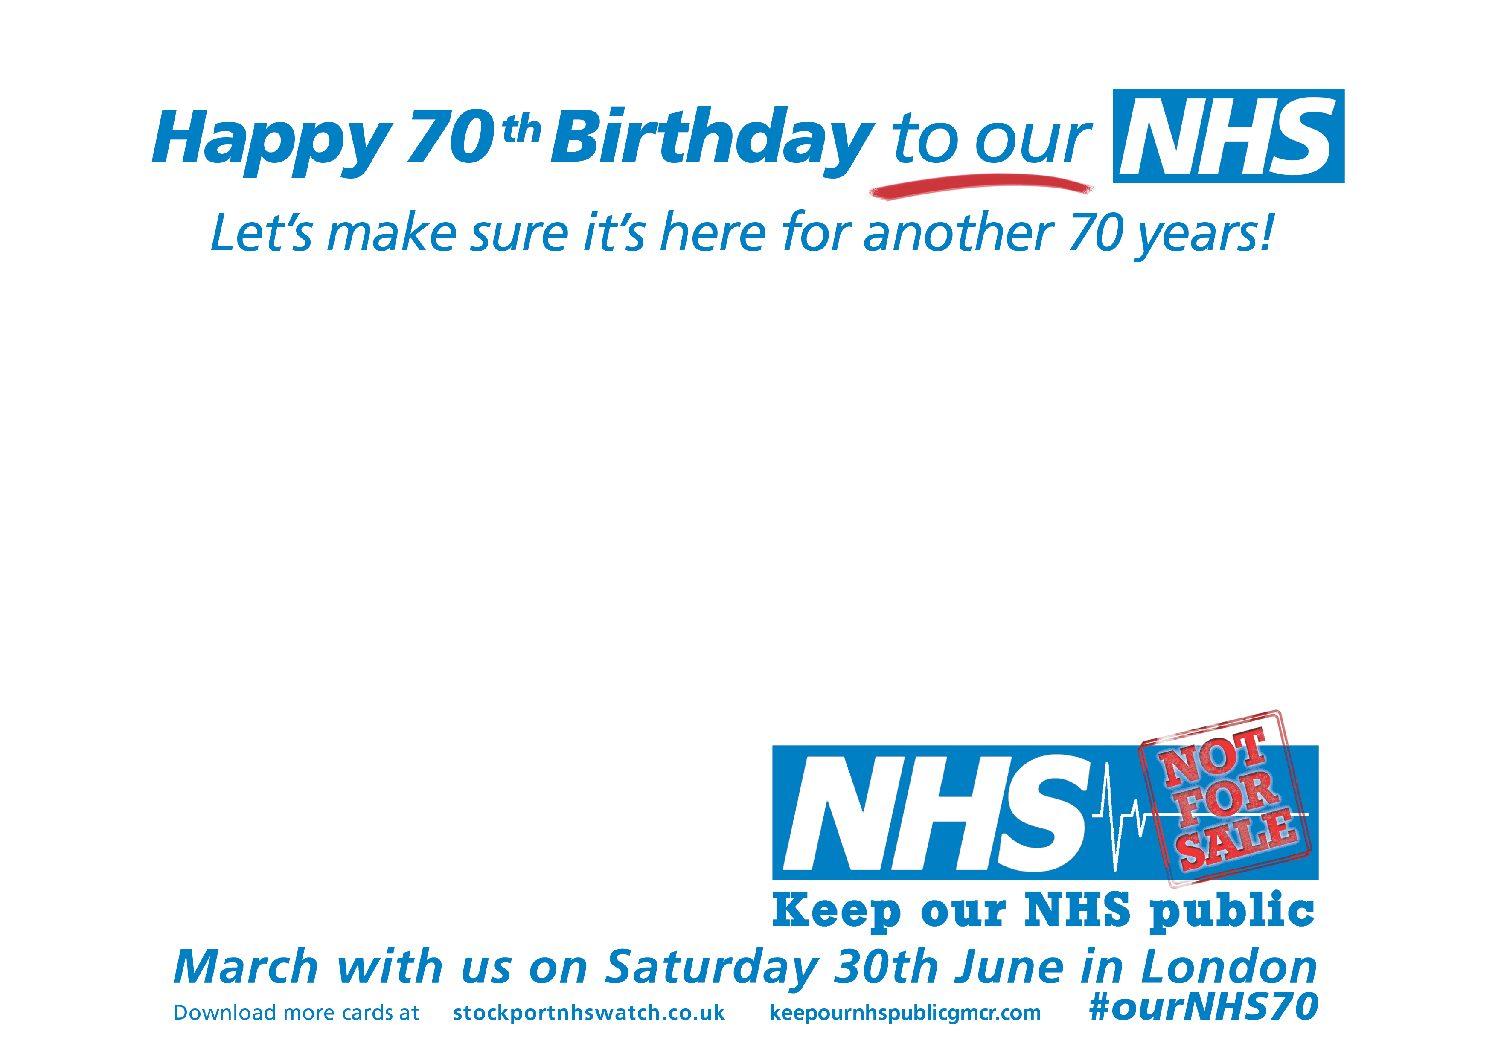 NHS Birthday Card Version 1